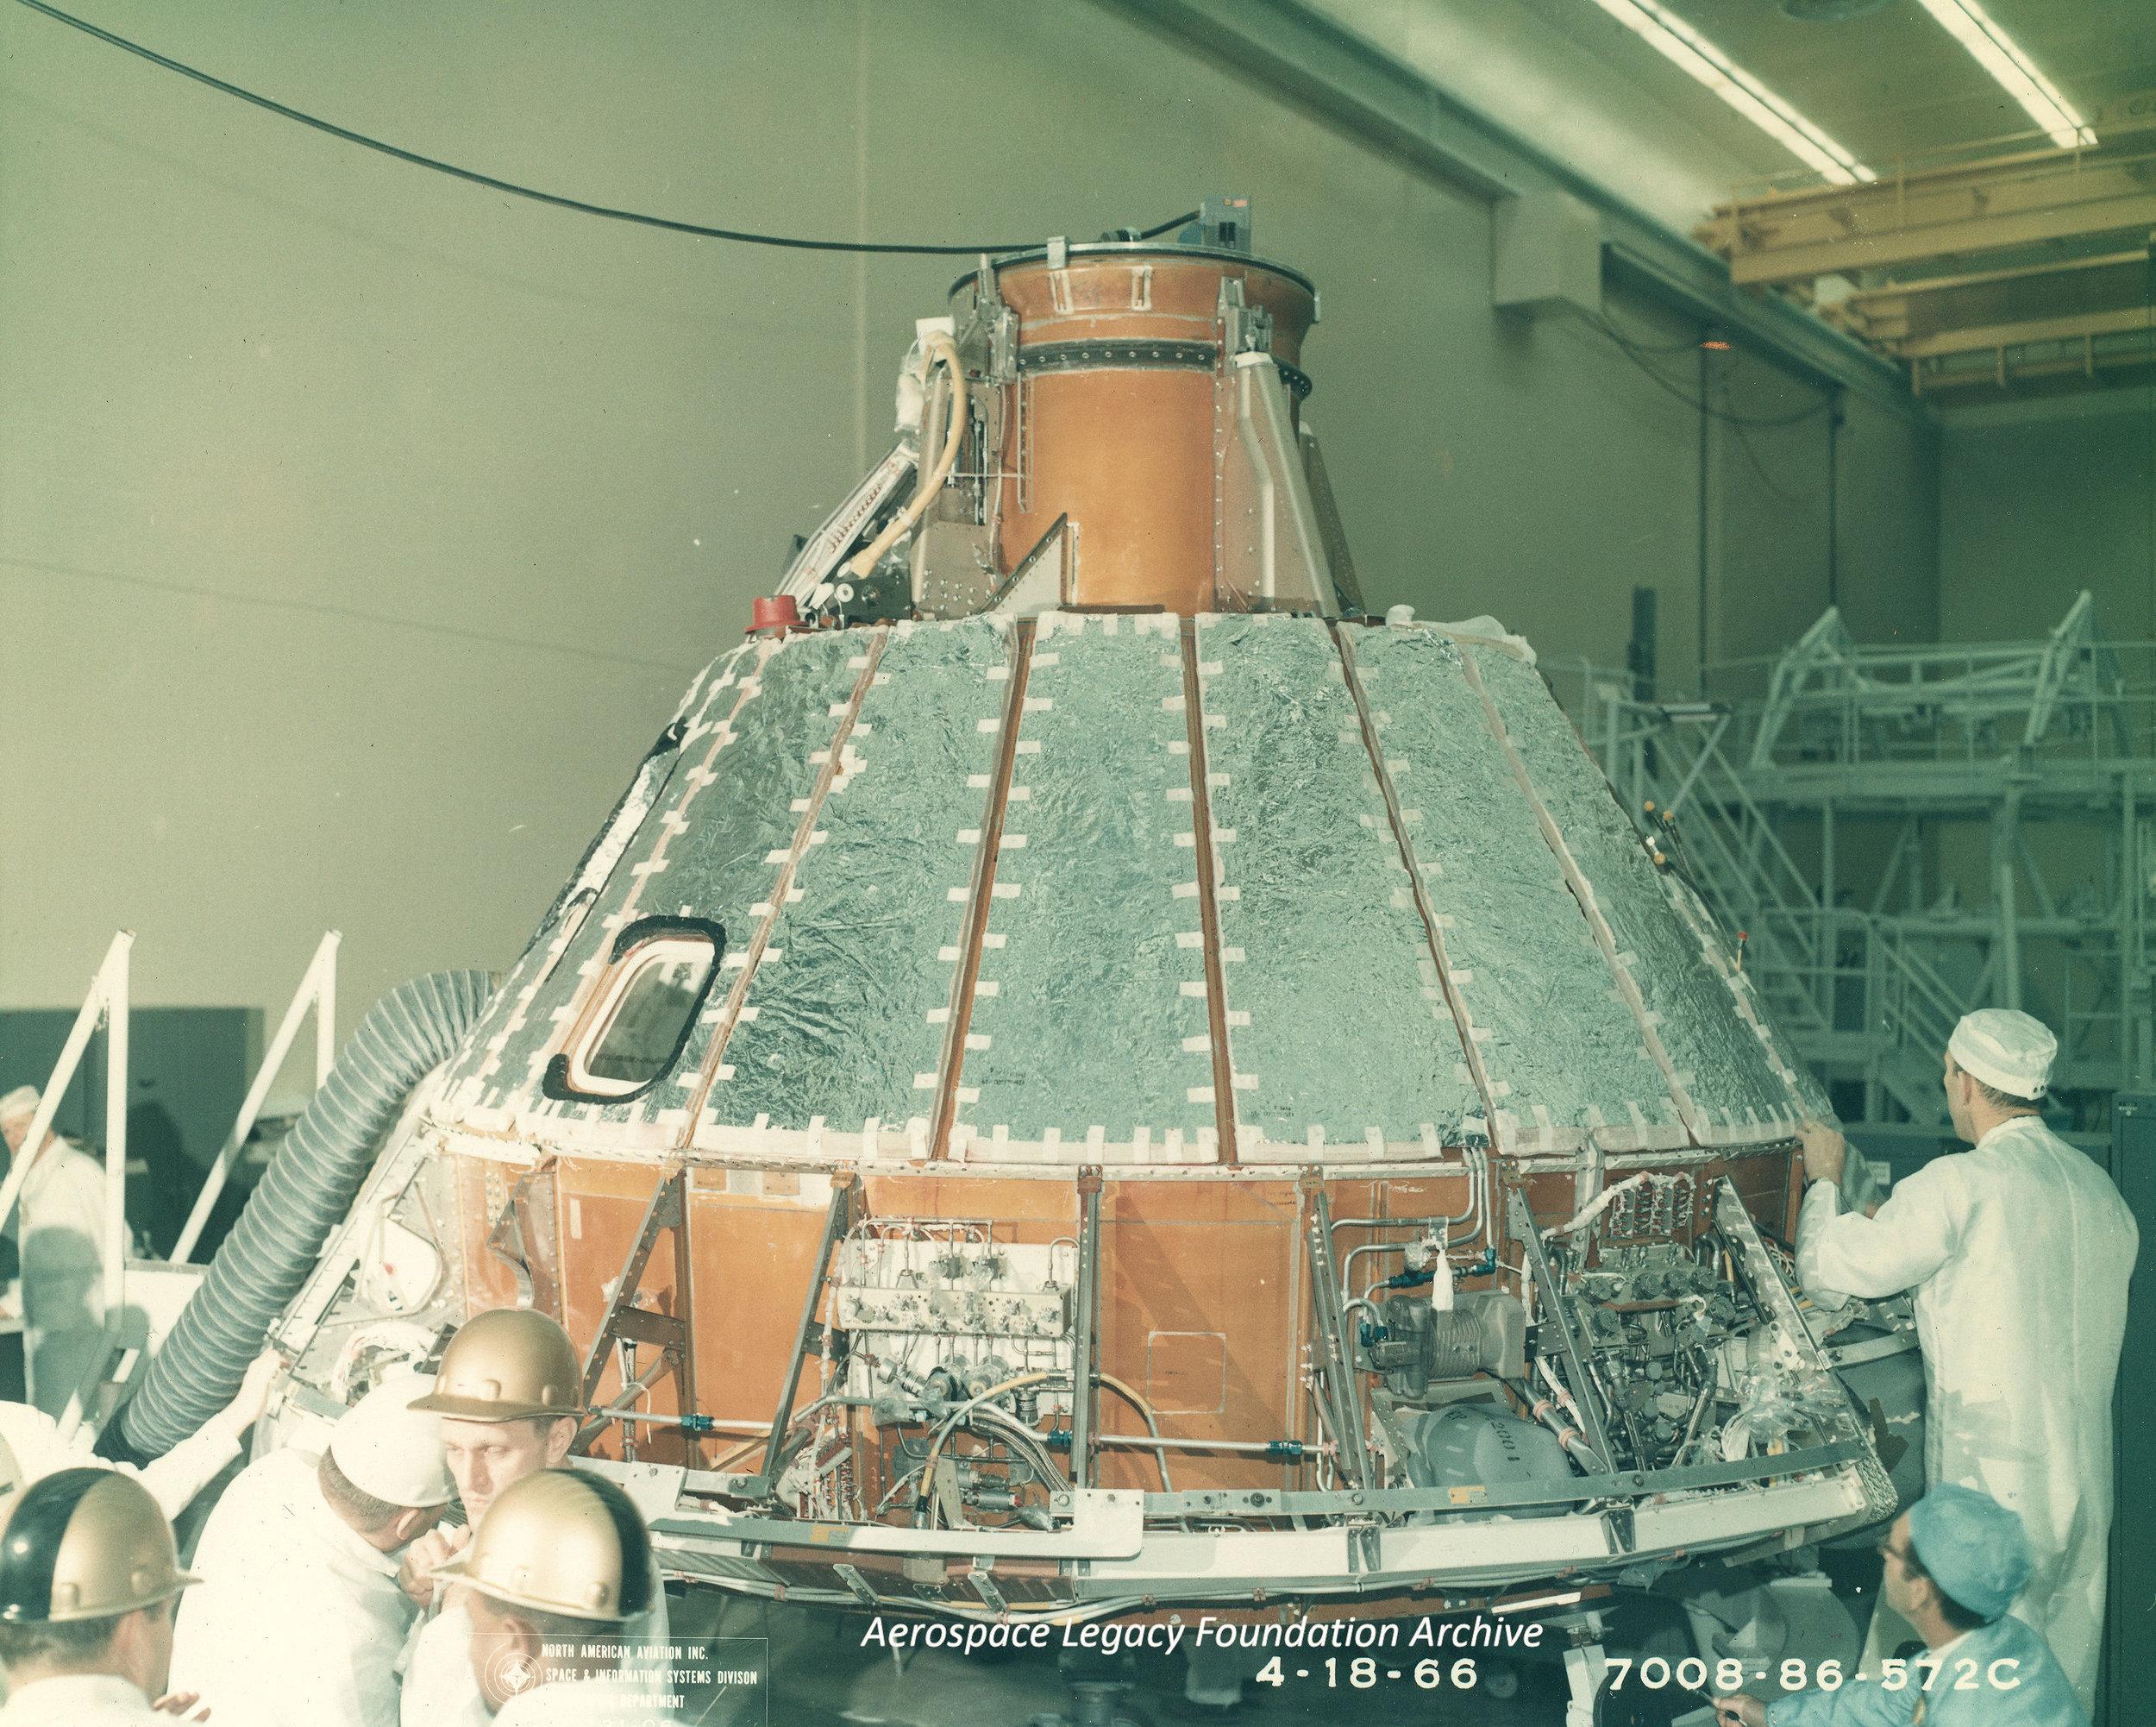 Apollo Capsule 4 18 66 7008 86 572clabeled.jpg